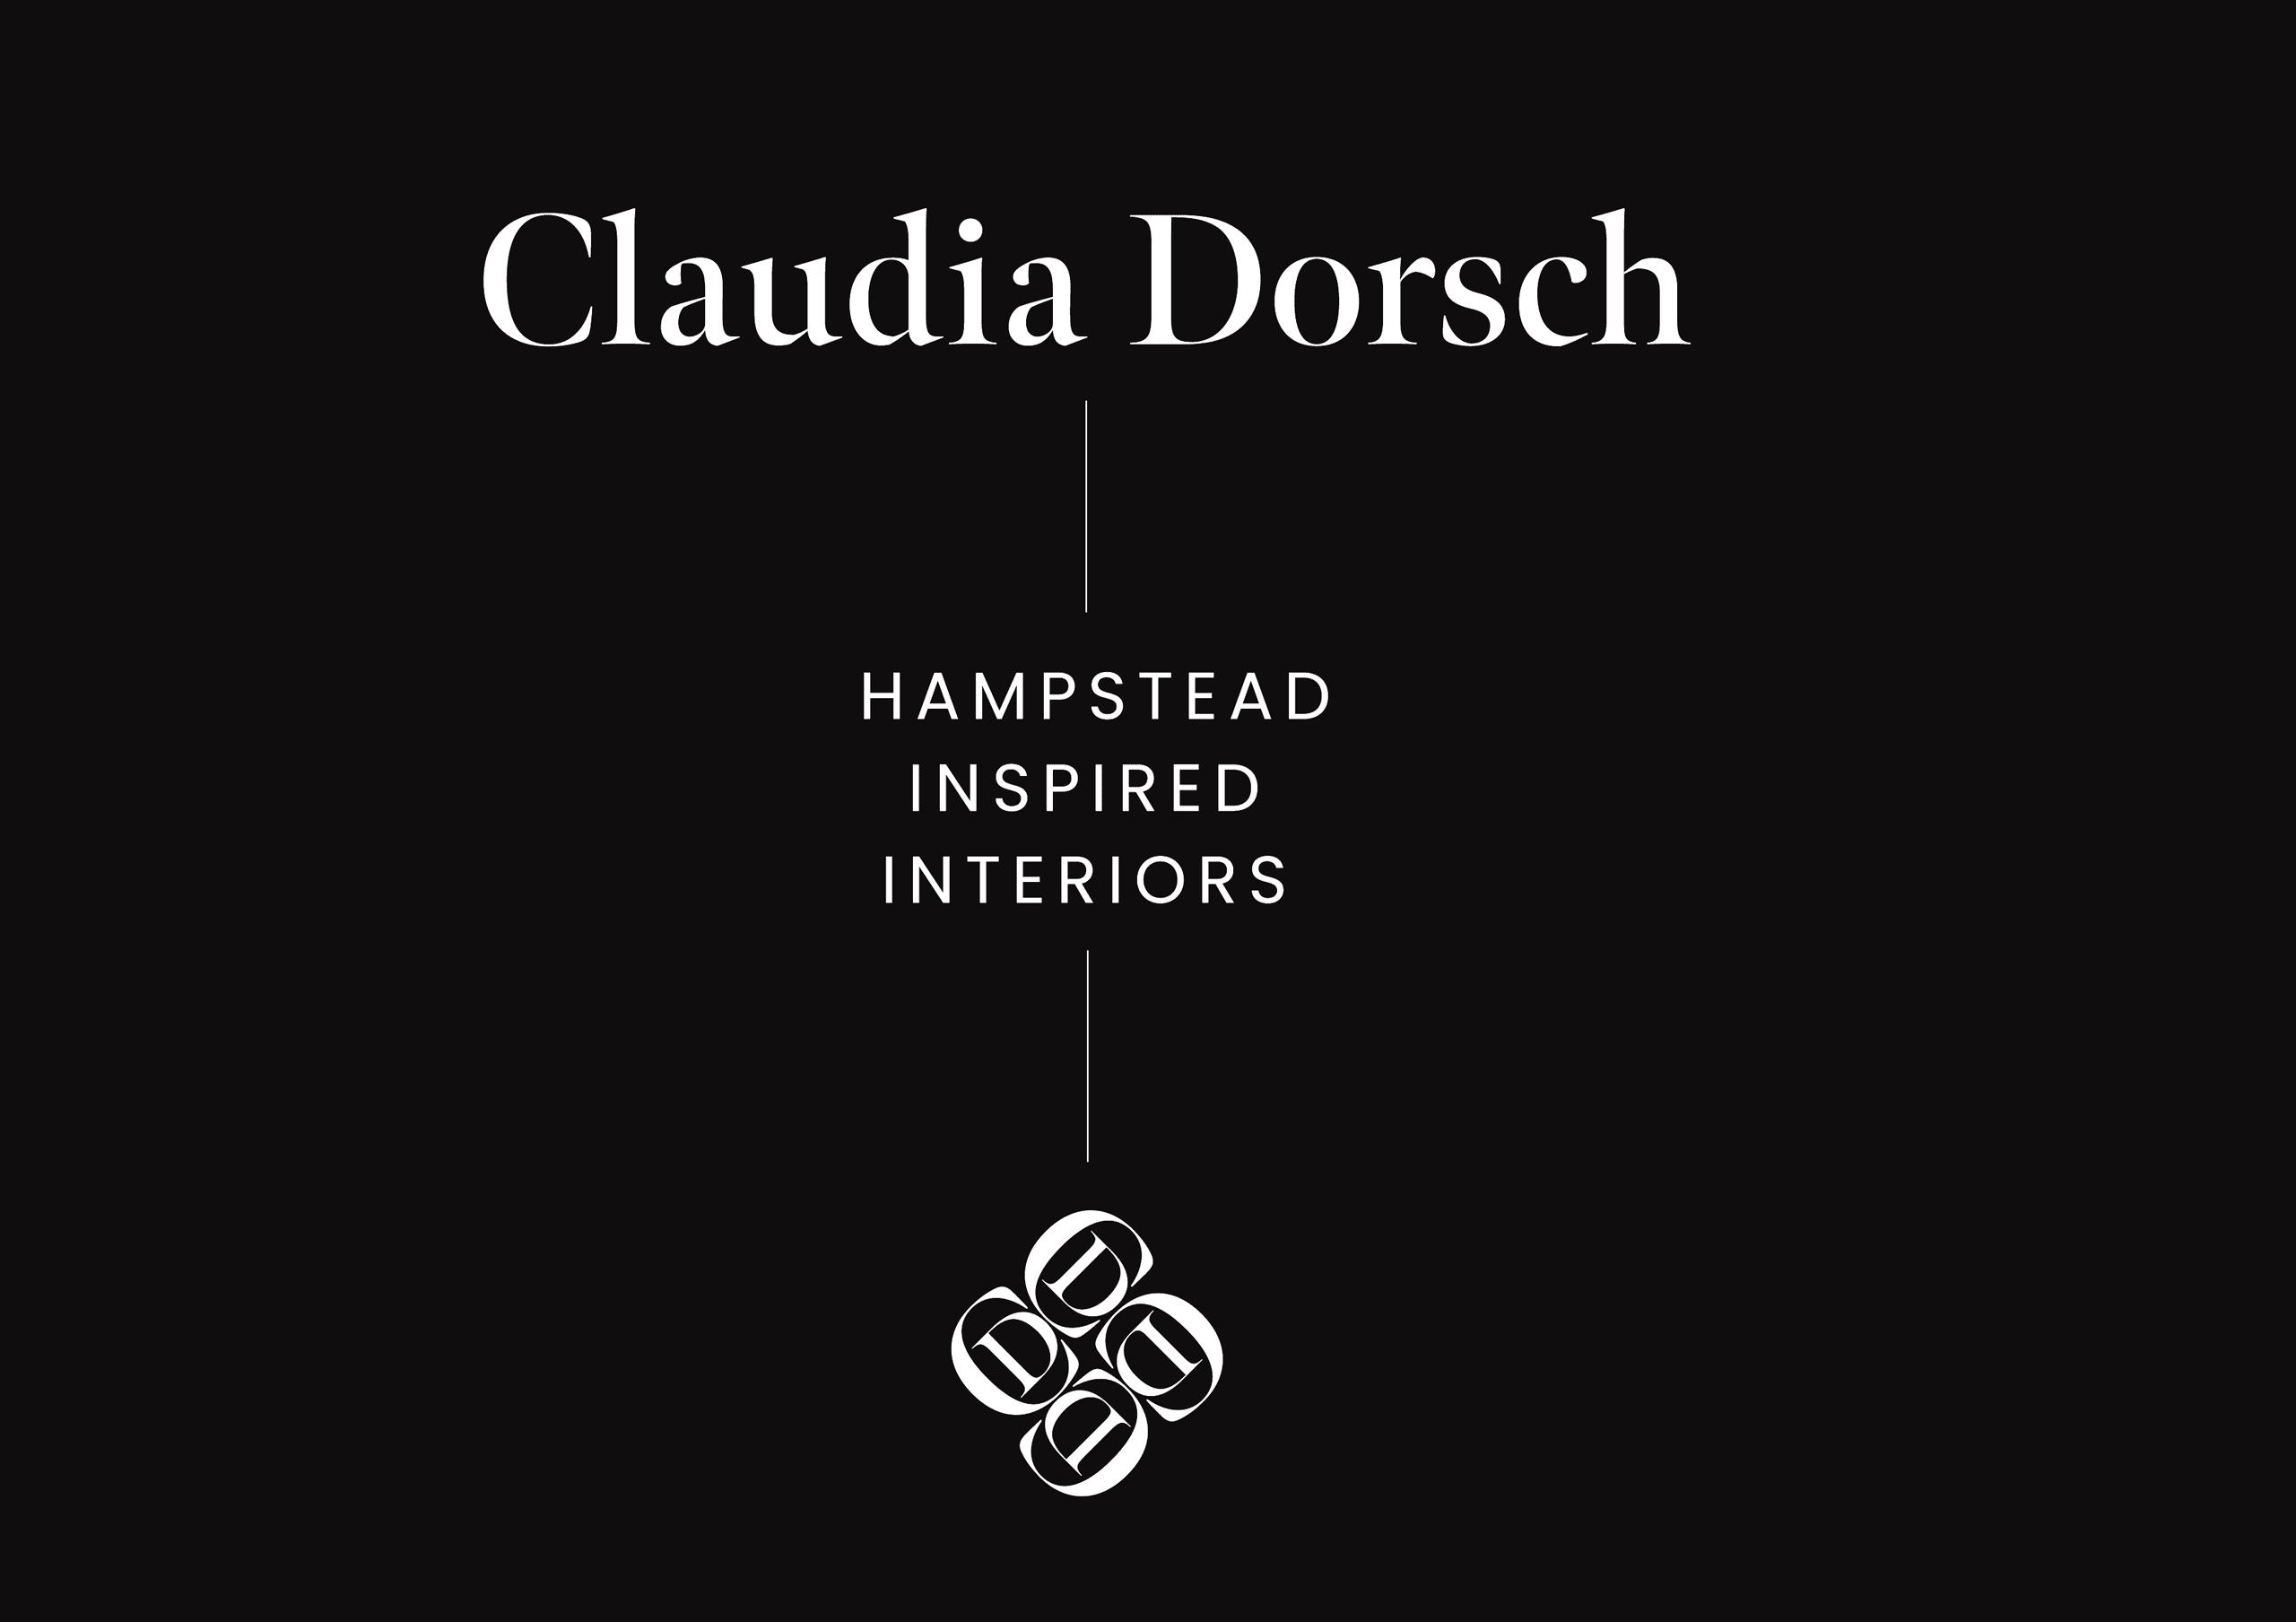 Claudia Dorcsh identity